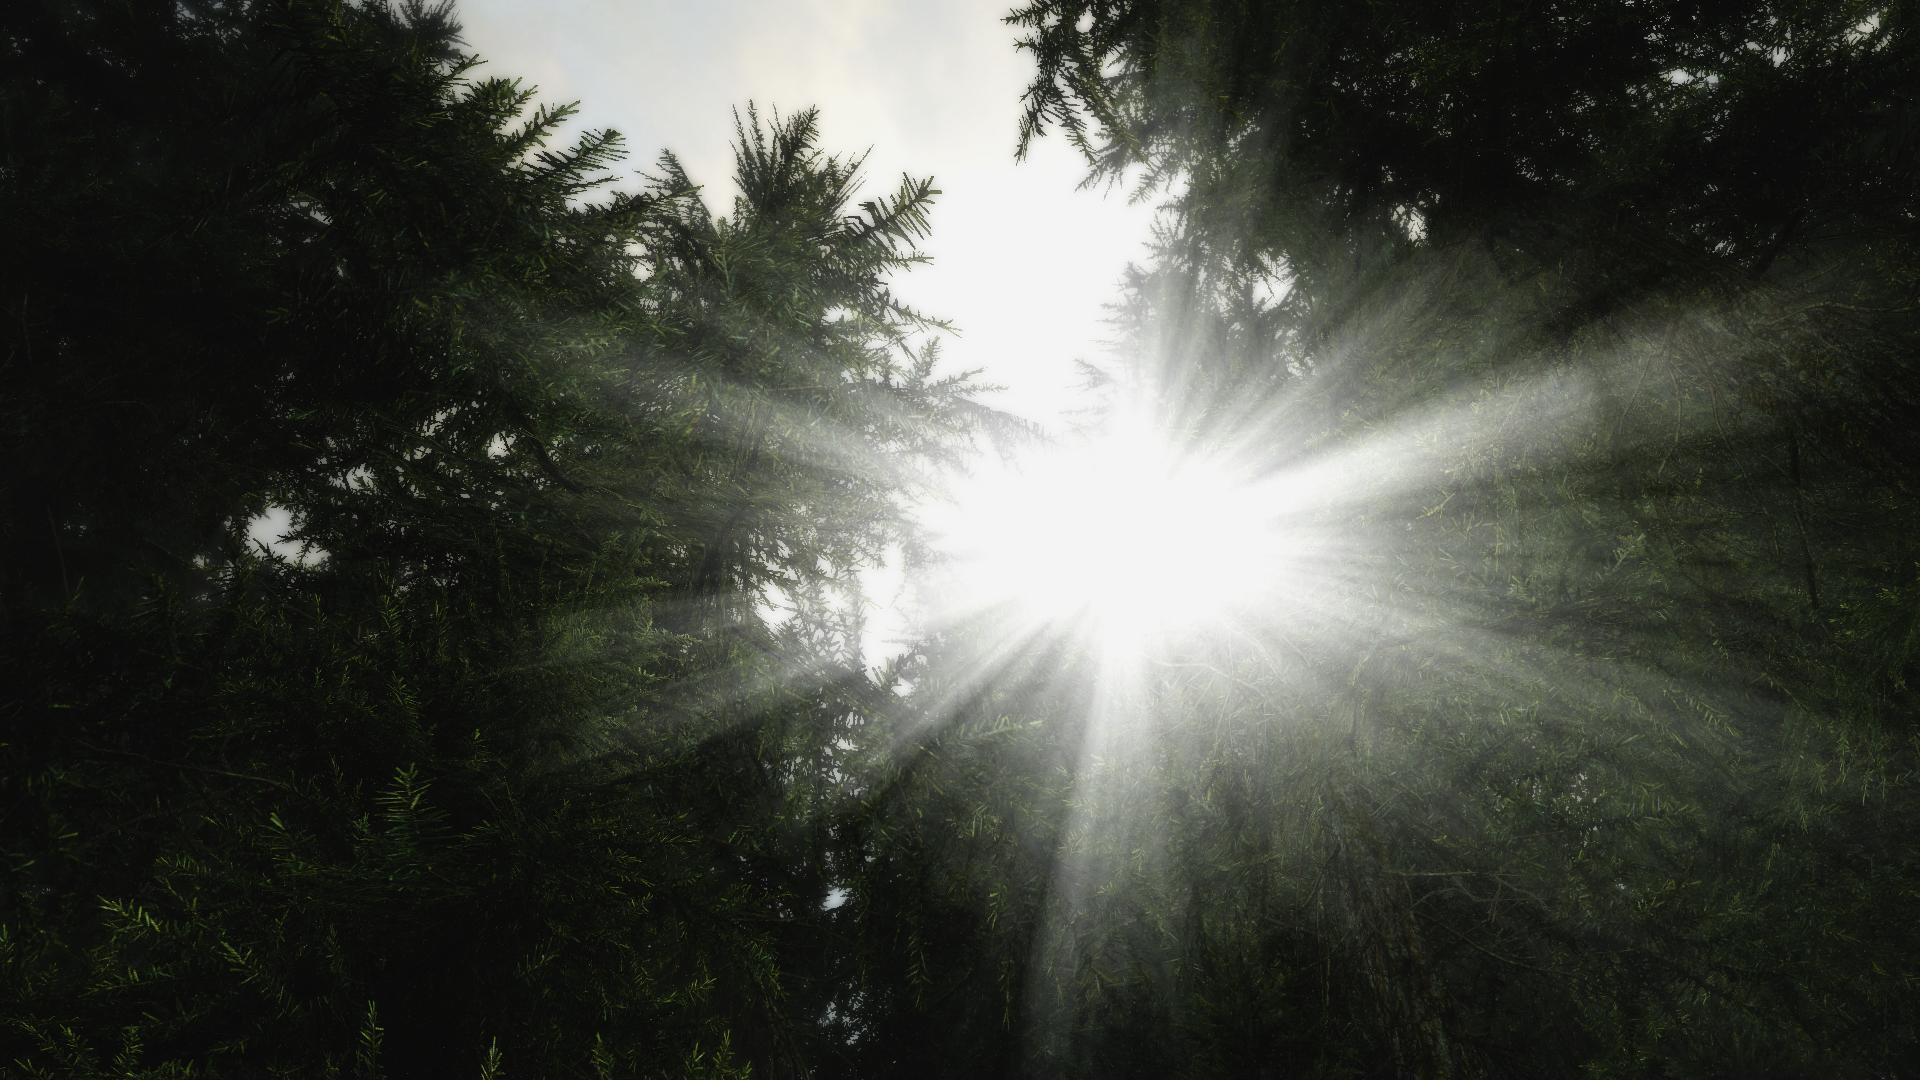 Skyrim. yes, this is skyrim.. gee willikers batman skyrim trees sun